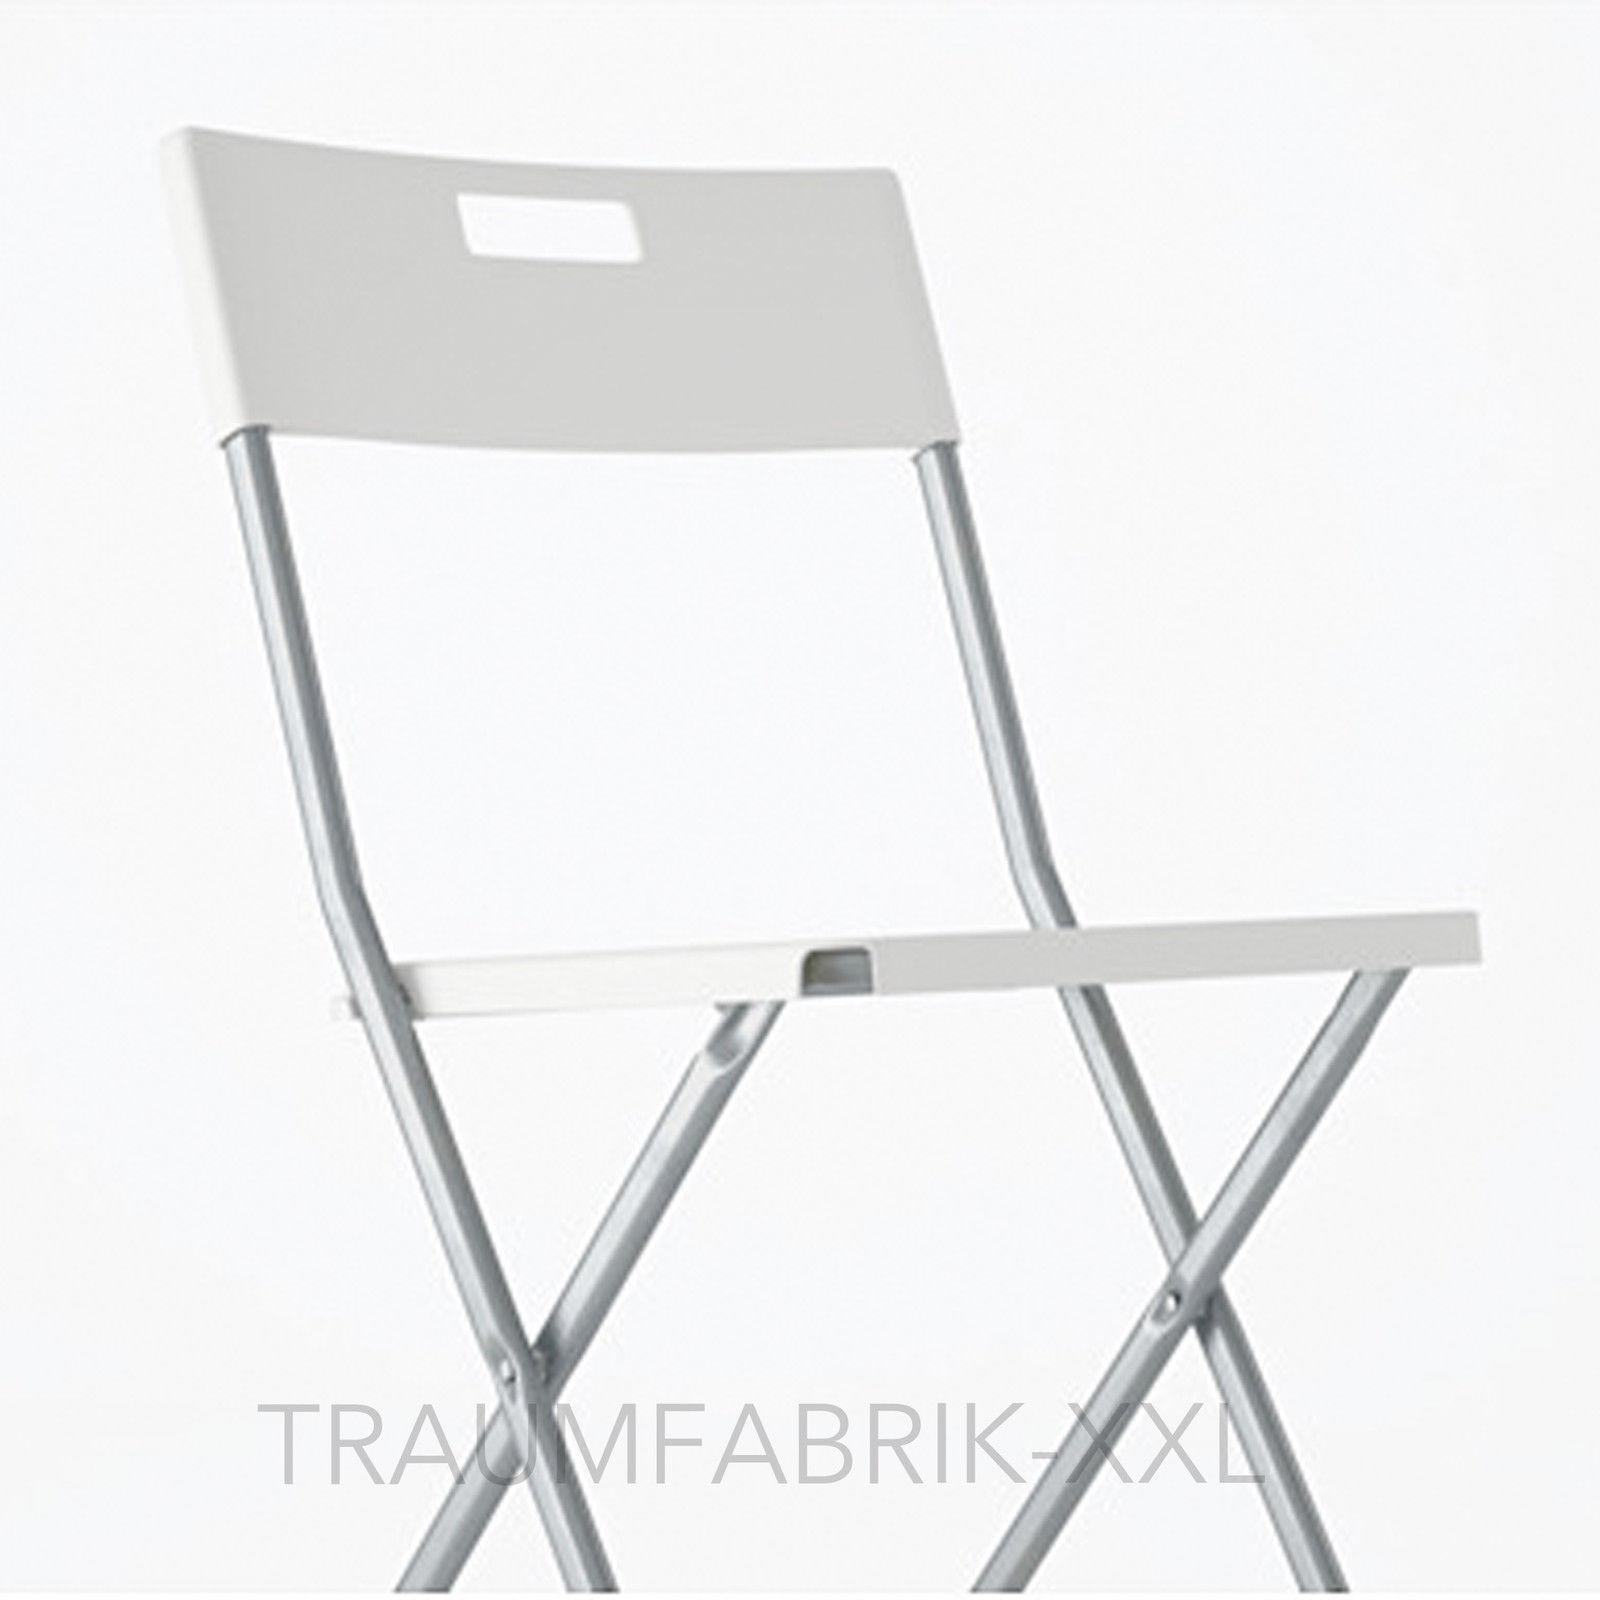 ikea gunde balkonstuhl wei klappstuhl g stestuhl besucherstuhl balkonstuhl traumfabrik xxl. Black Bedroom Furniture Sets. Home Design Ideas